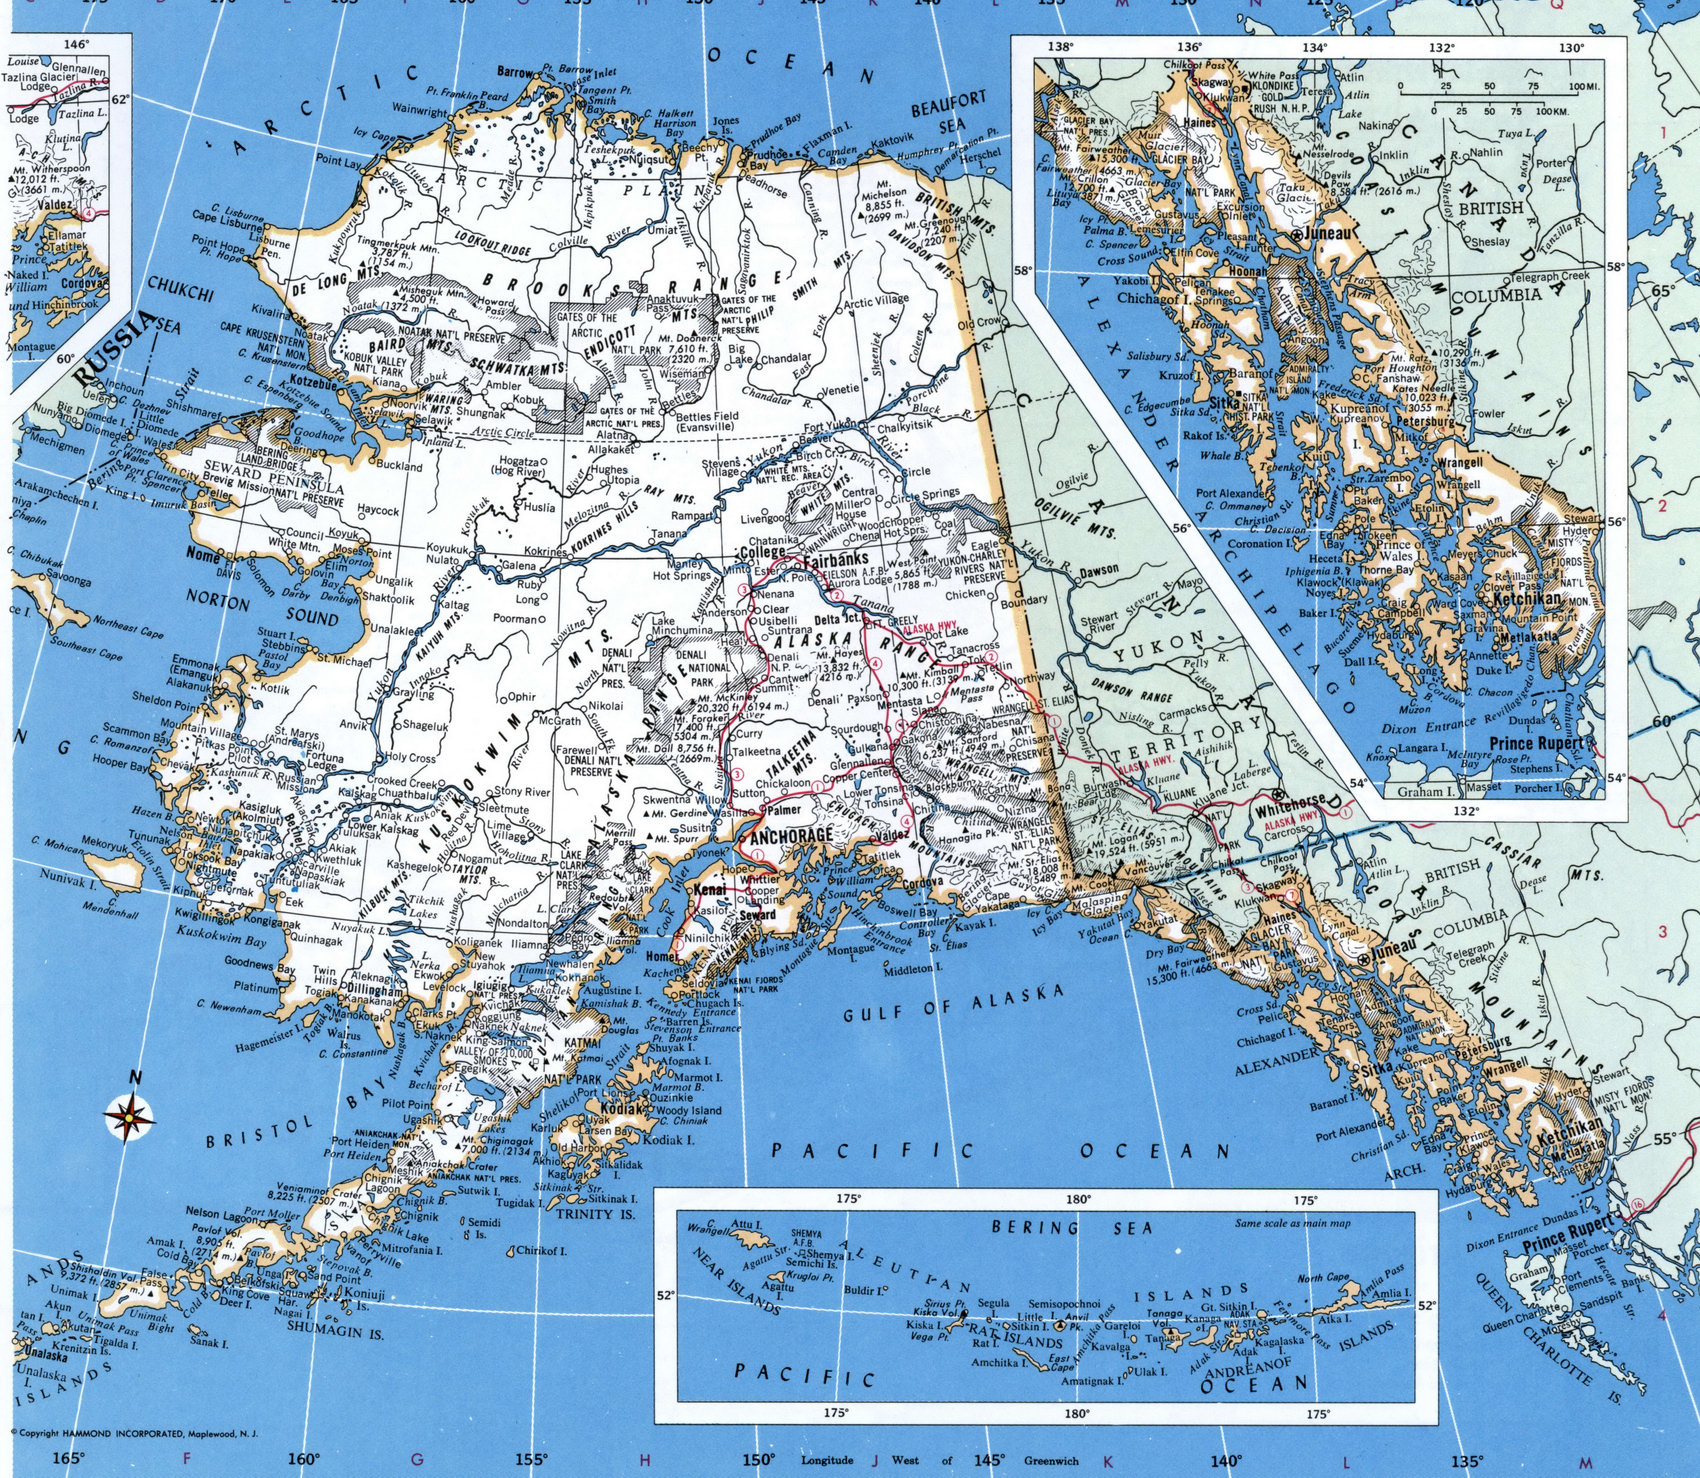 Alaska County - Alaska map with cities